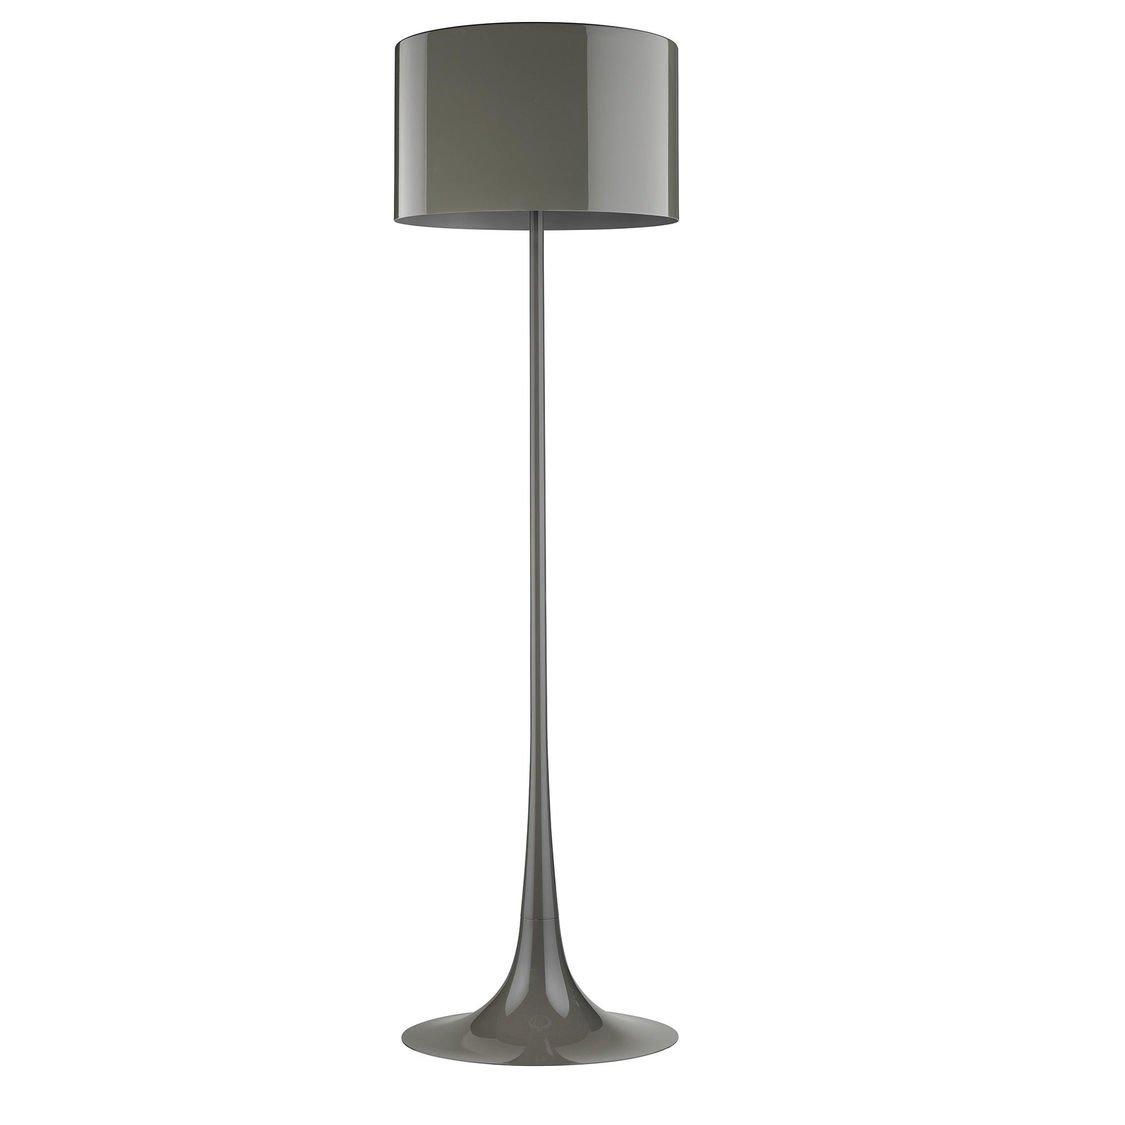 Wonderful Spun Light F Floor Lamp